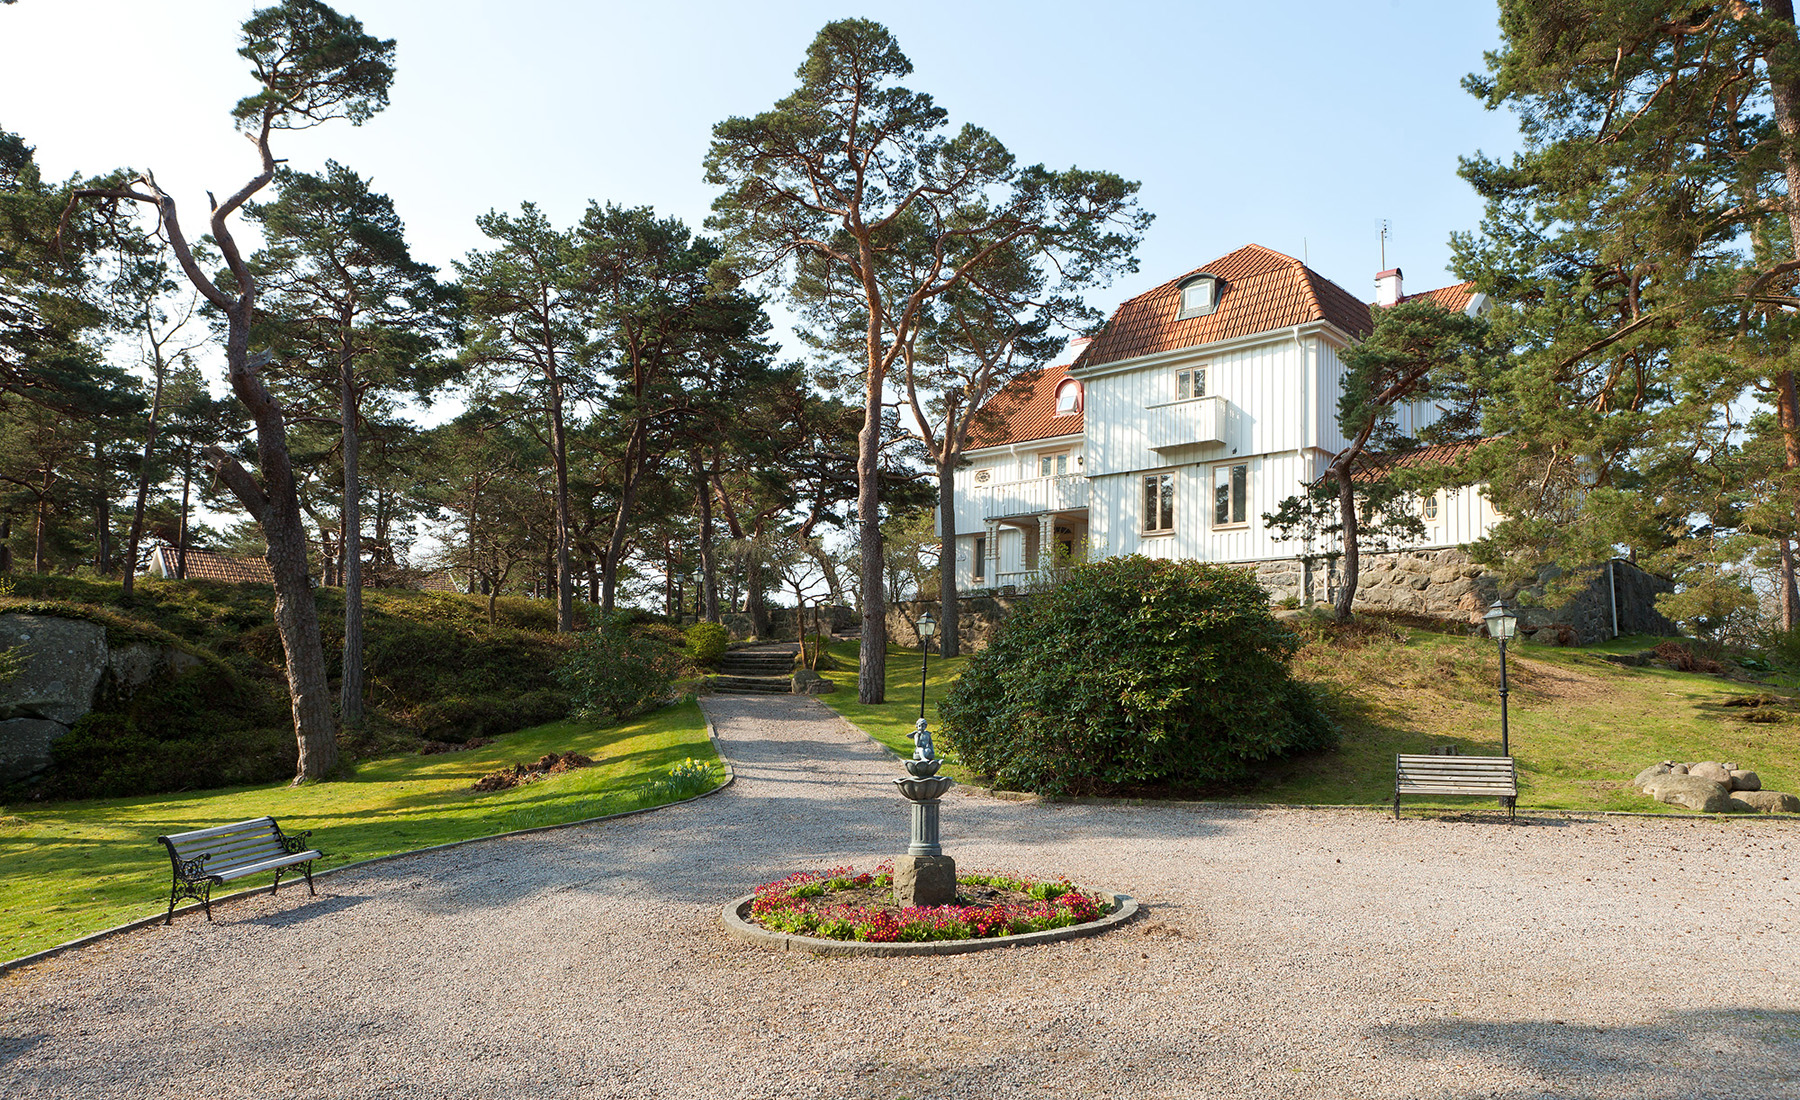 sales property at Villa Furuhojd – Dan Brostrom's magnificent residence